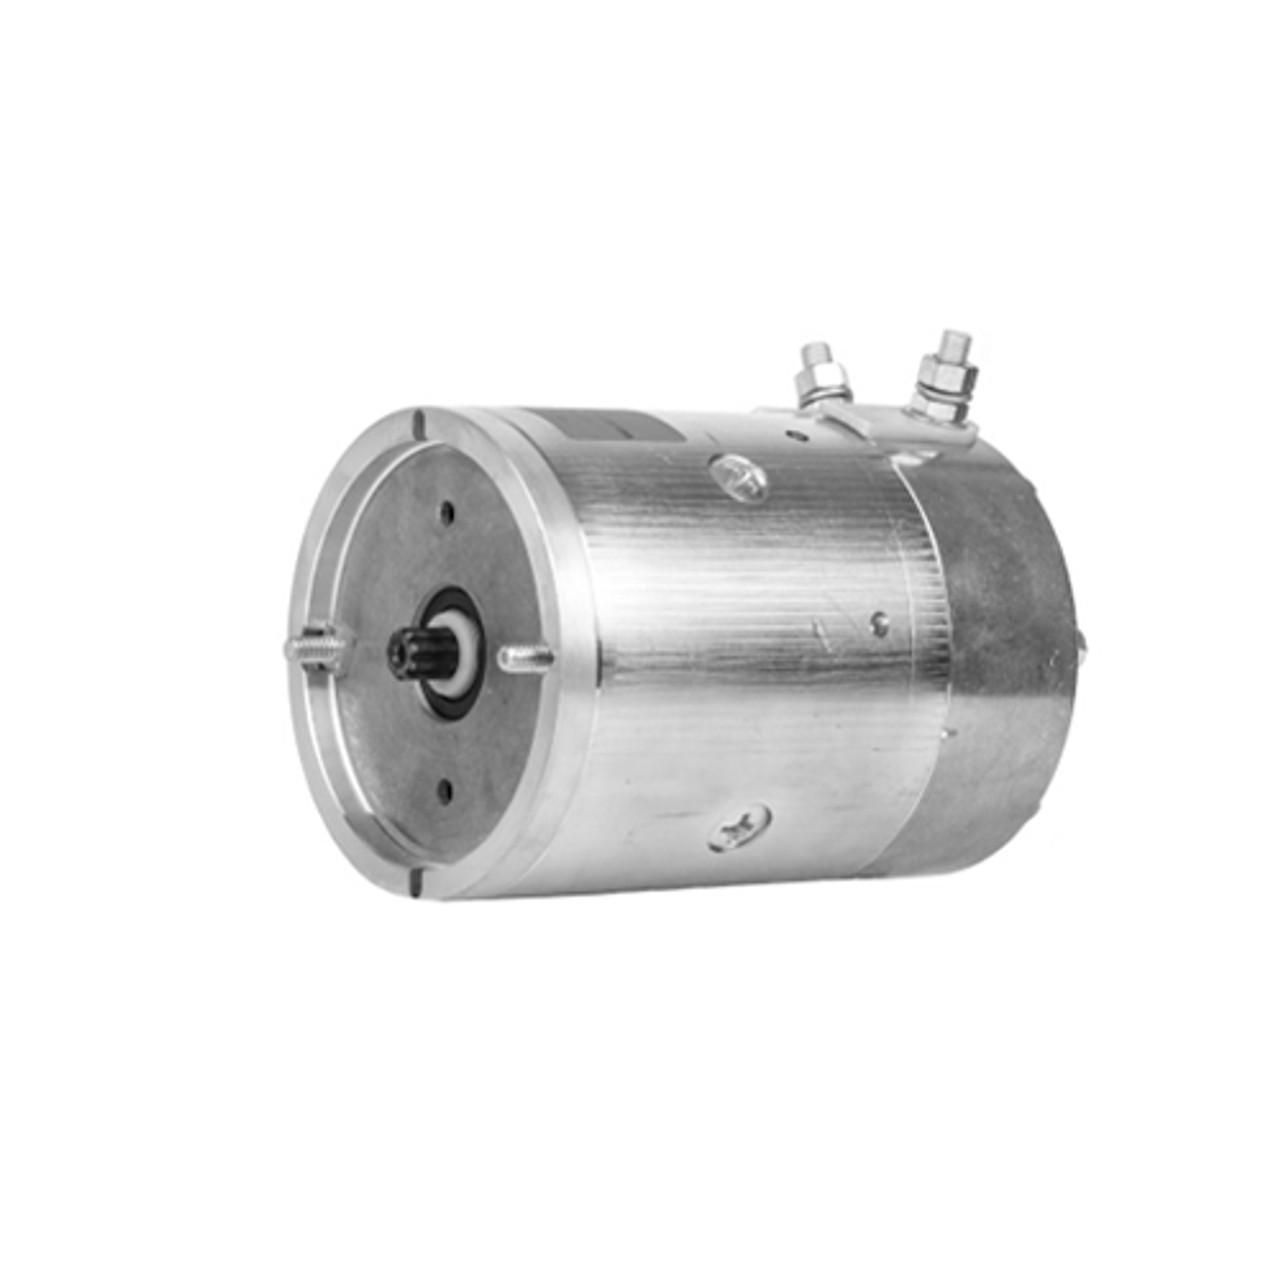 MM401 Letrika 12v 1 6KW CW Rotation Motor SPX FLUID POWER FENNER